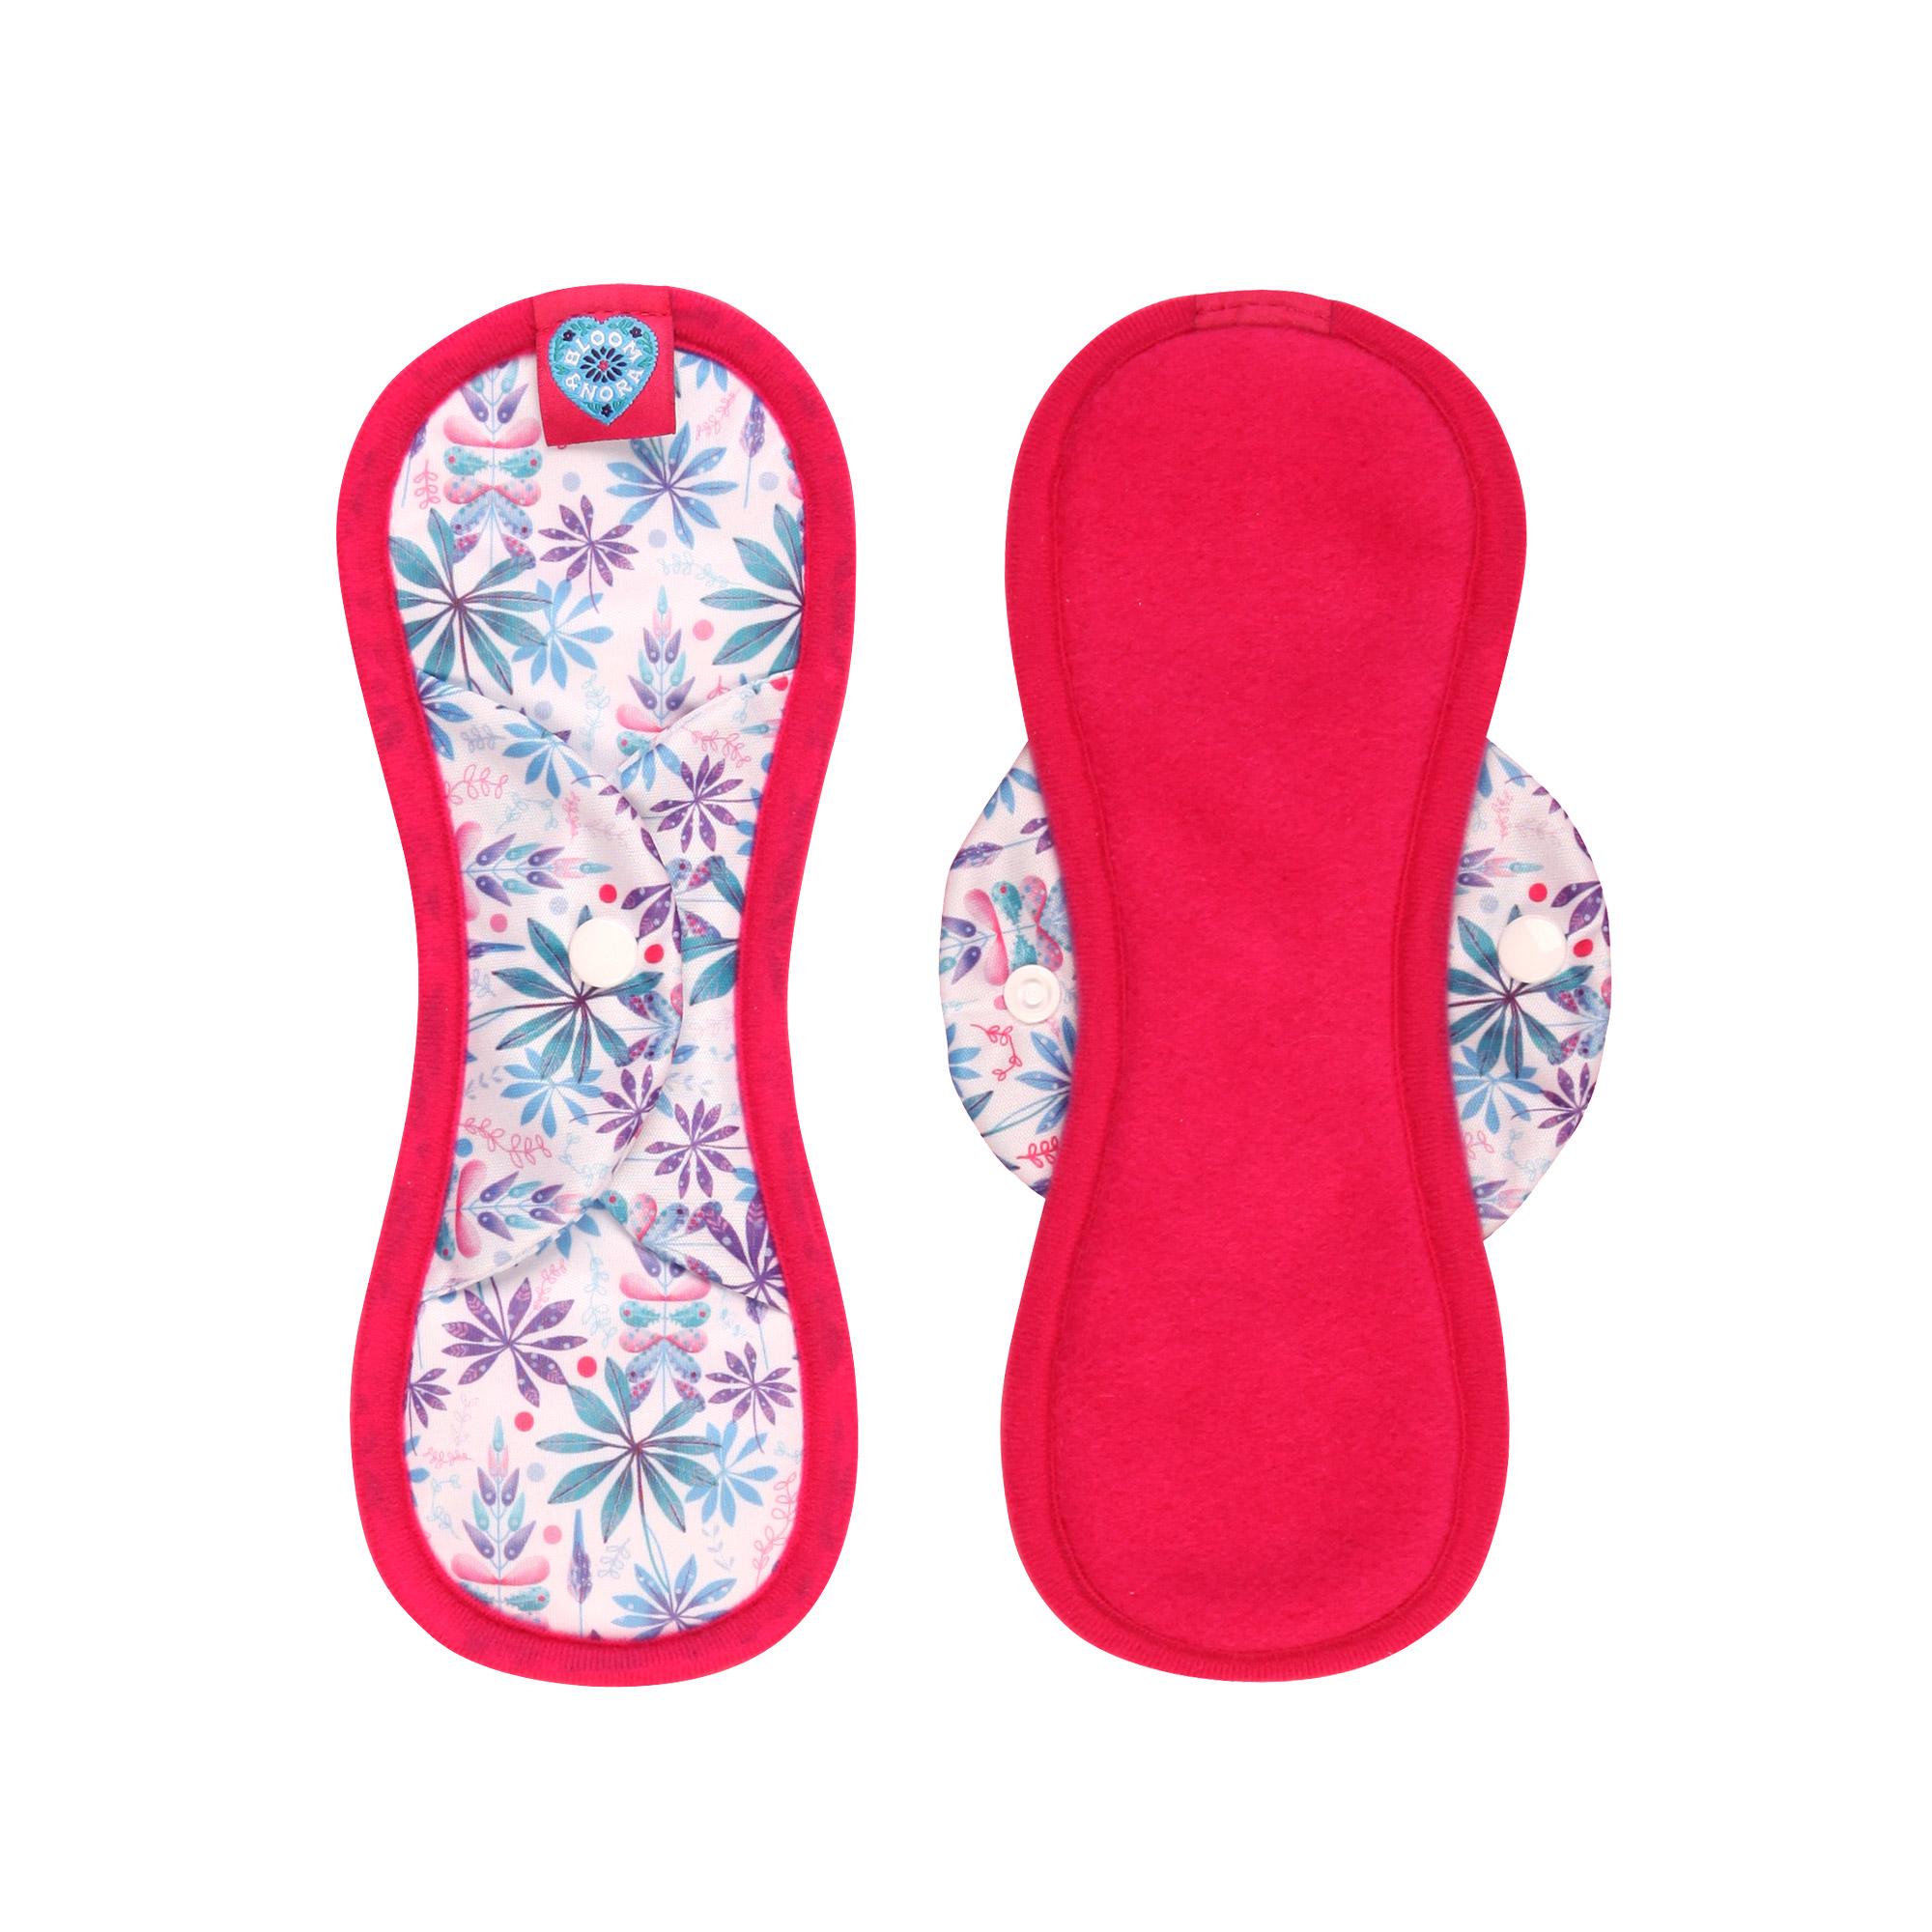 Midi Sanitary Towel - Bloom and Nora